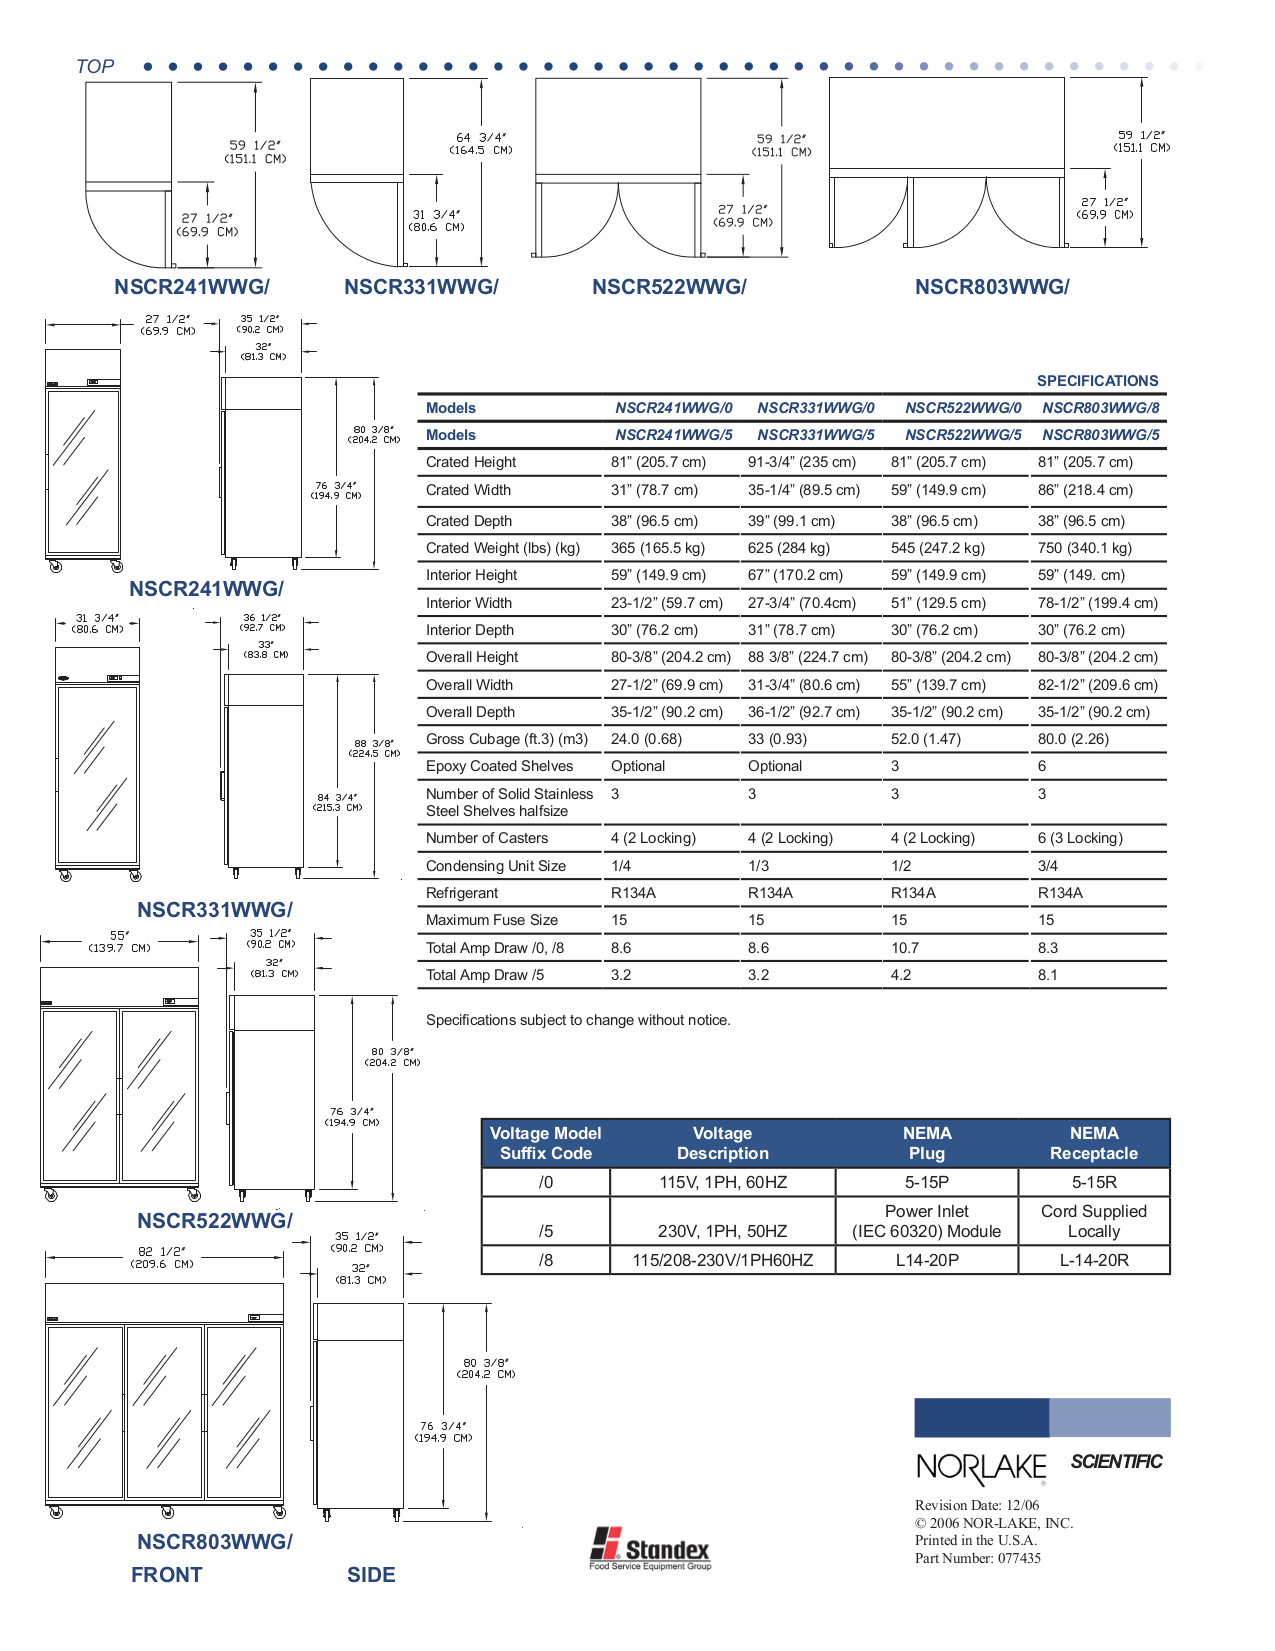 pdf for Norlake Refrigerator NSCR331WWG manual